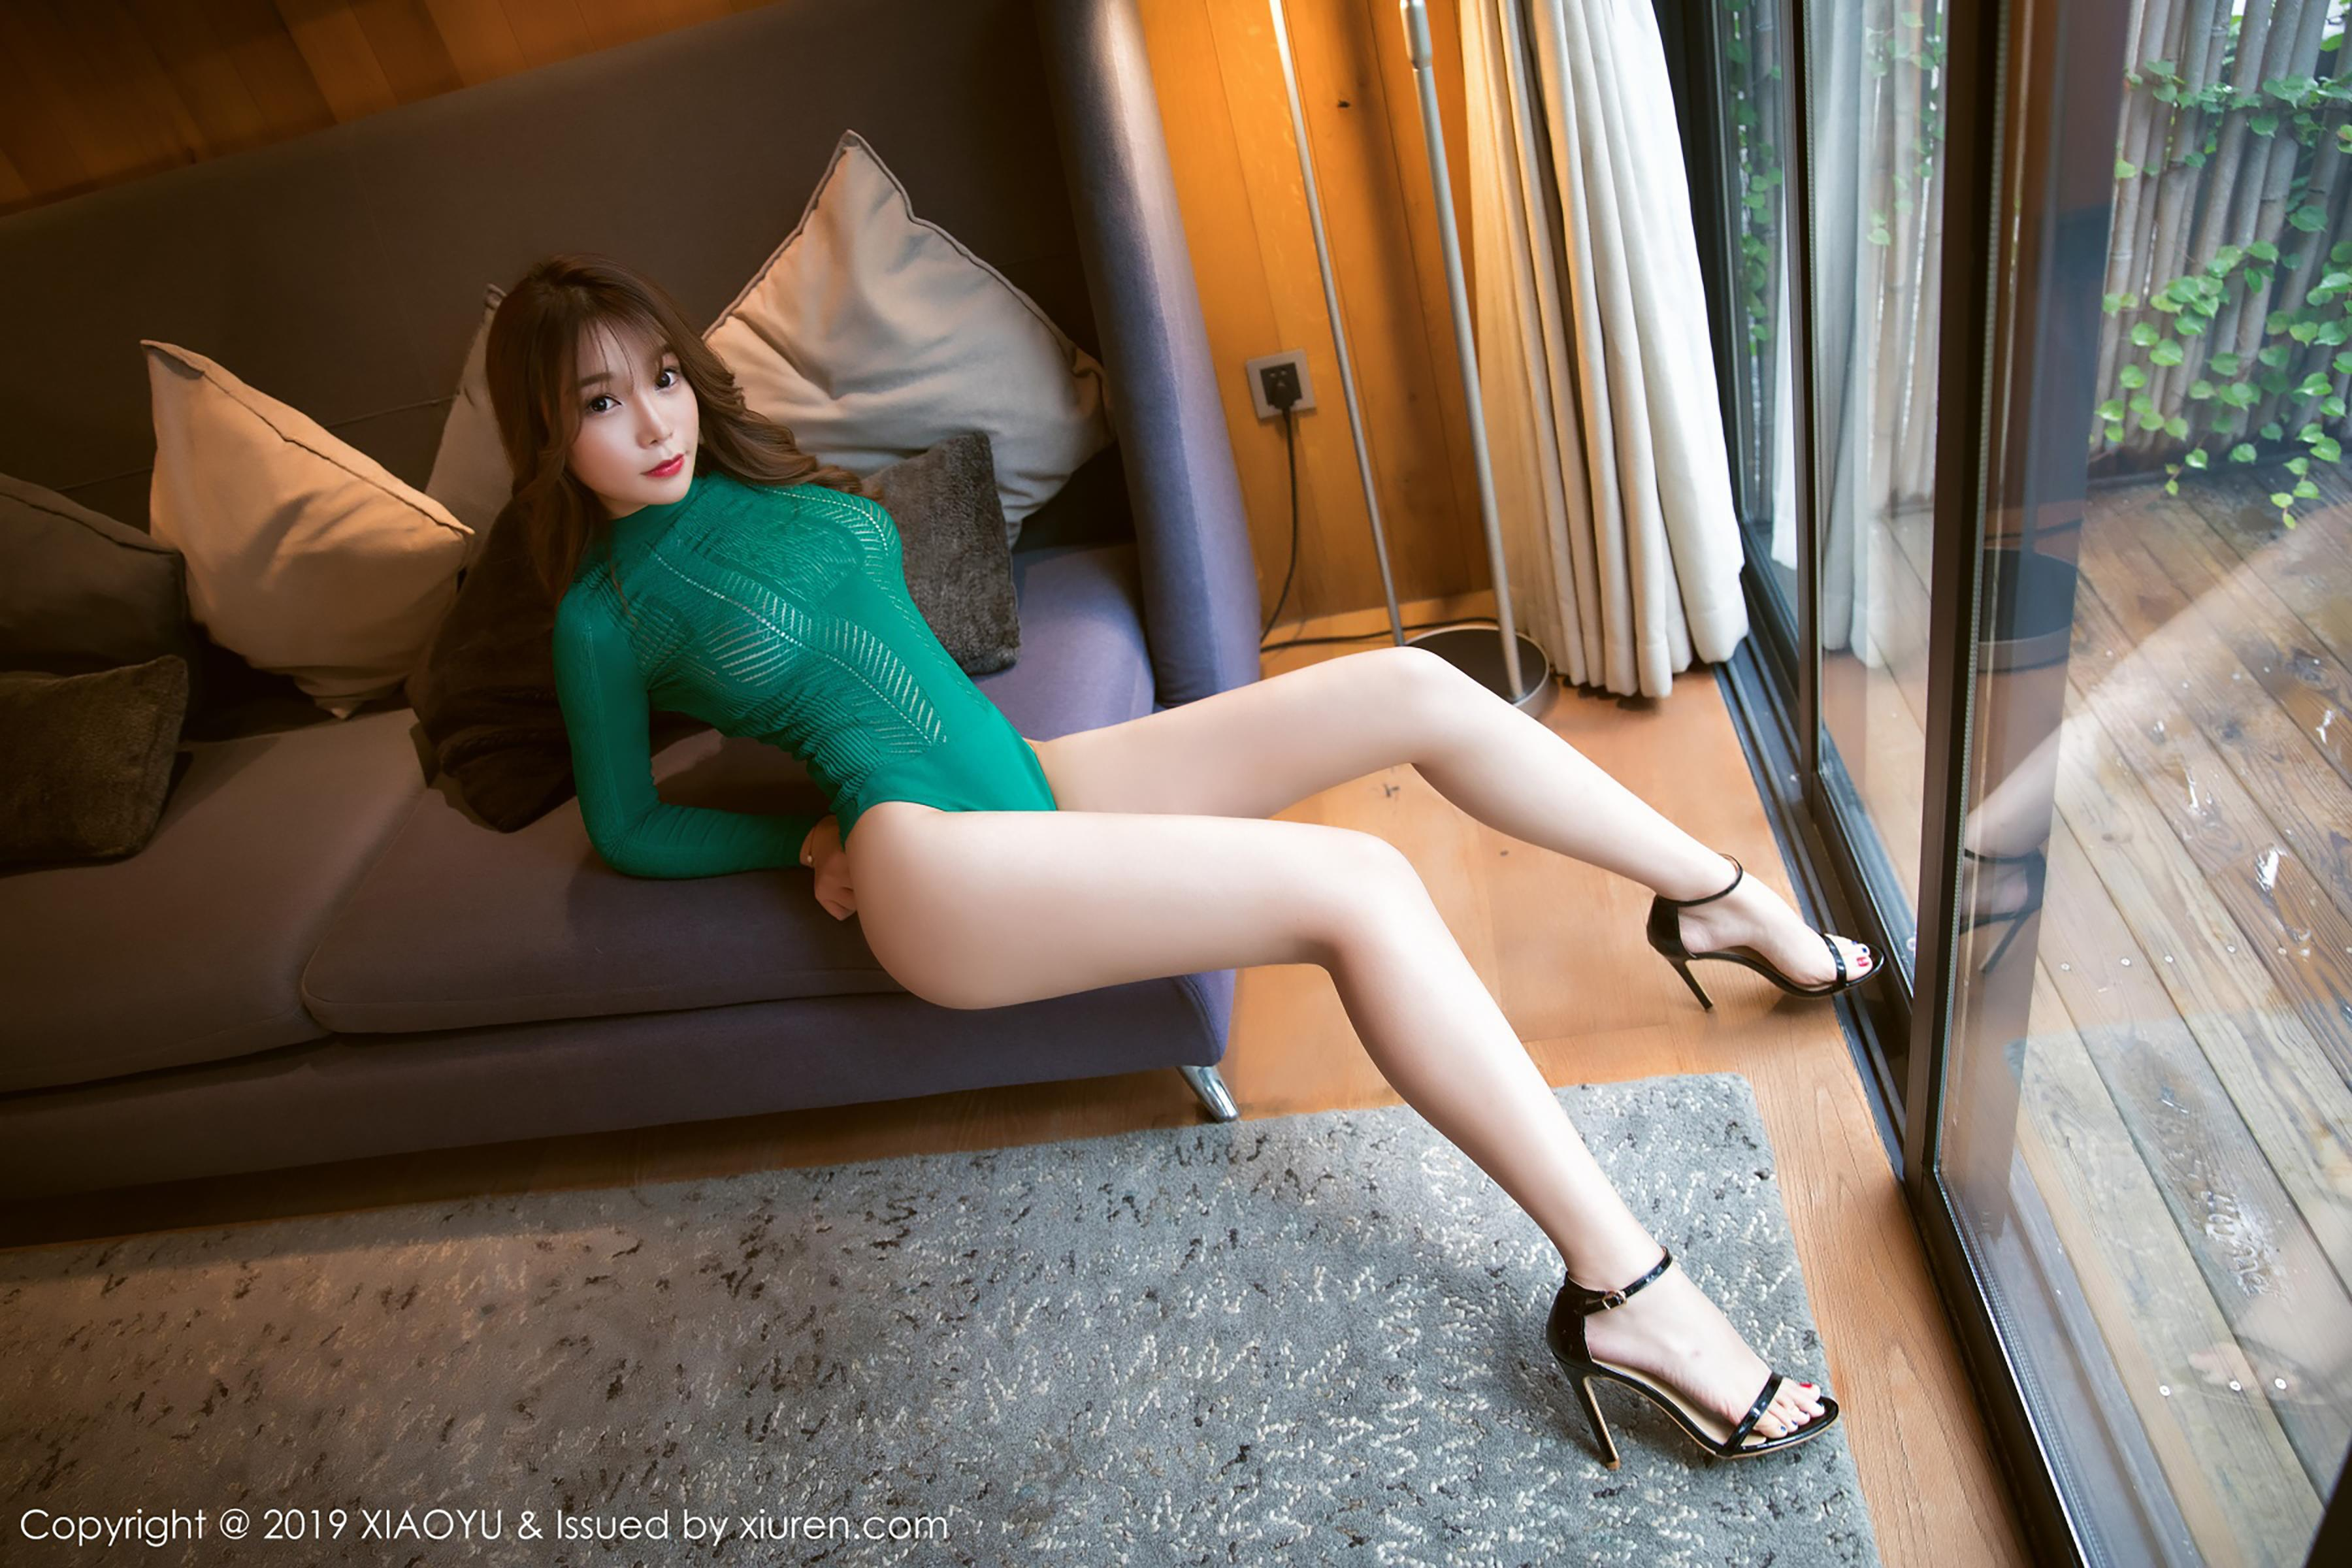 [XIAOYU画语界]YU20190211VOL0018 芝芝Booty 红色紧身上衣与黑色蕾丝内衣加黑色丝袜美腿性感私房写真集